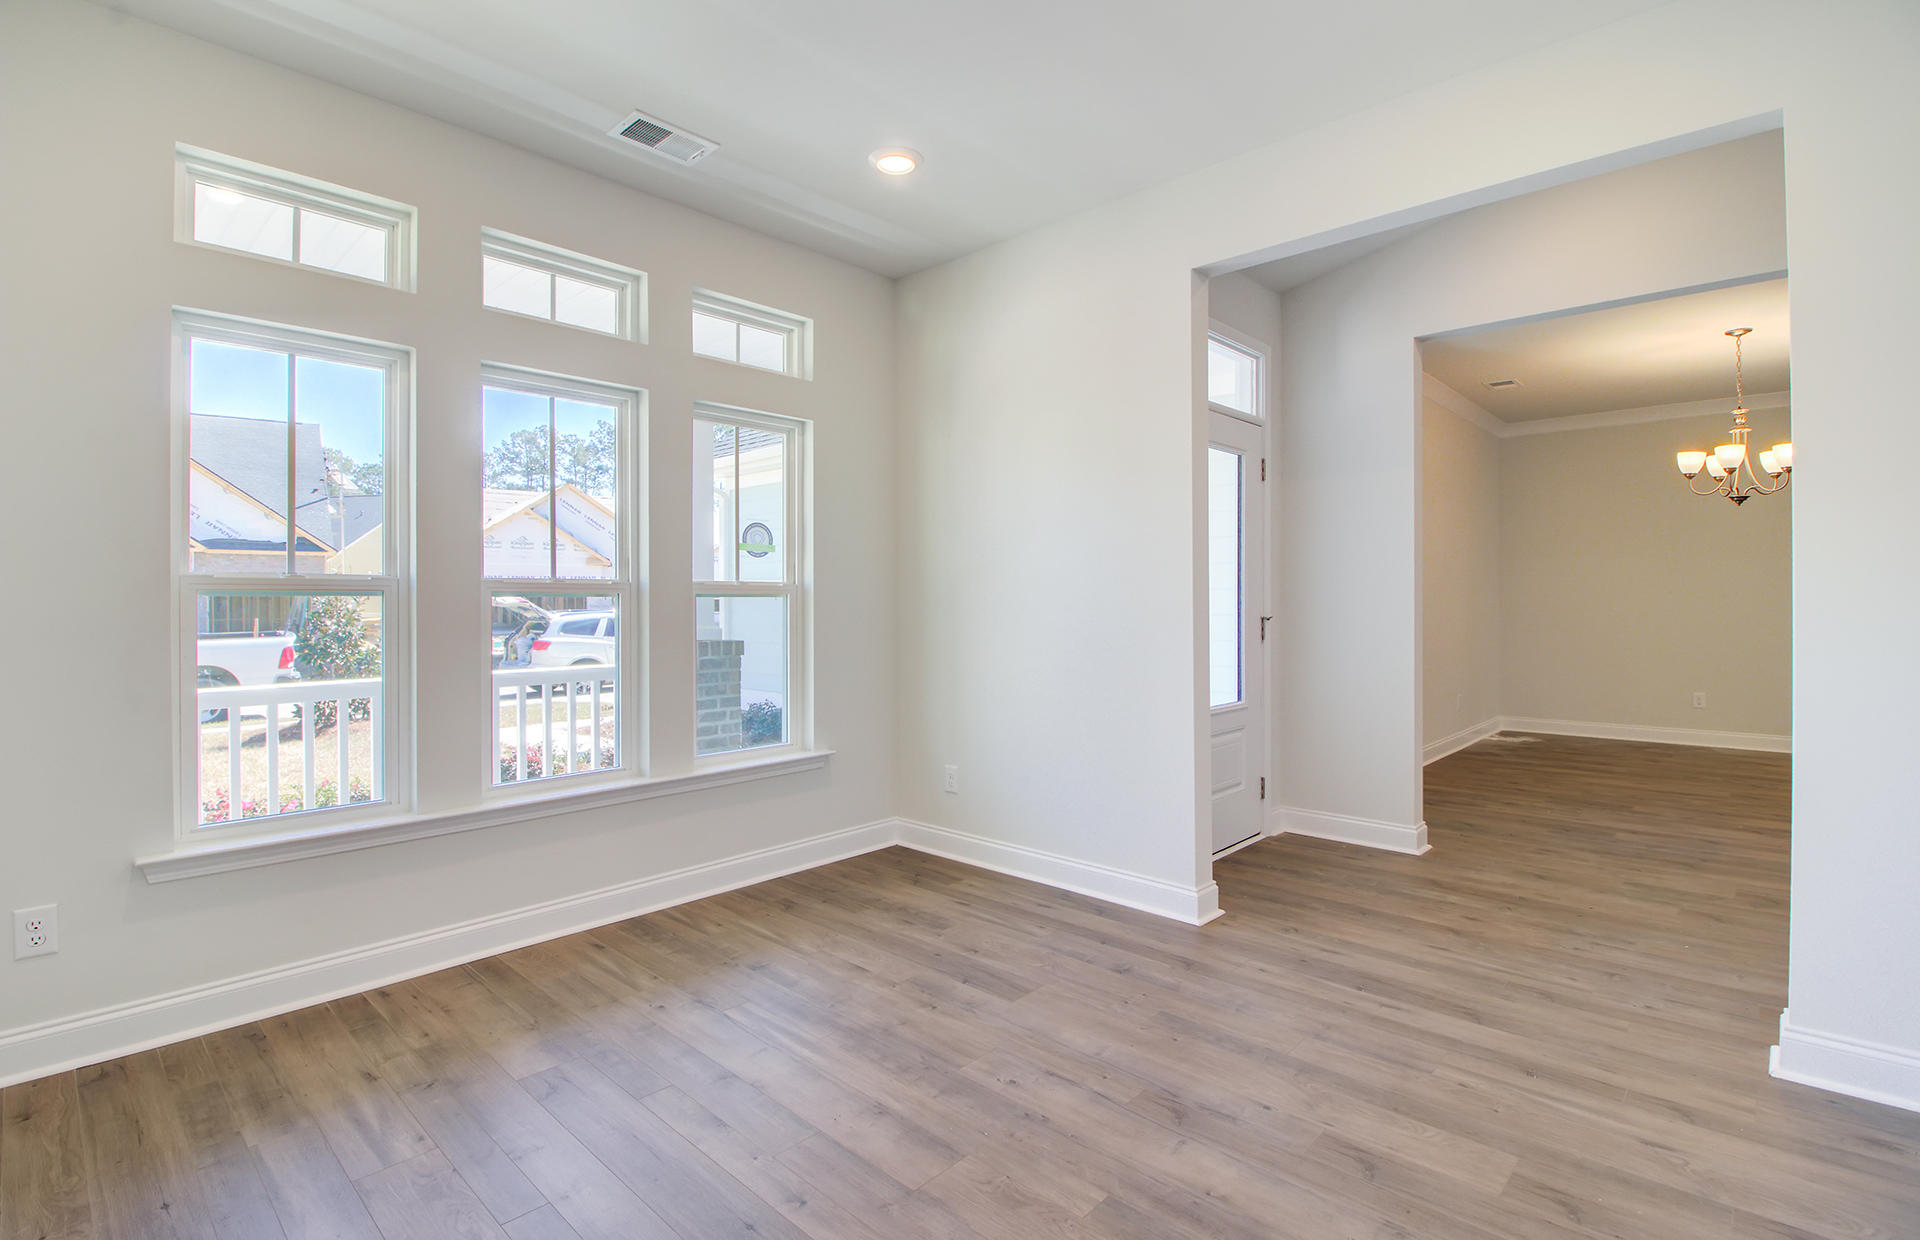 Park West Homes For Sale - 3066 Rice Field, Mount Pleasant, SC - 3